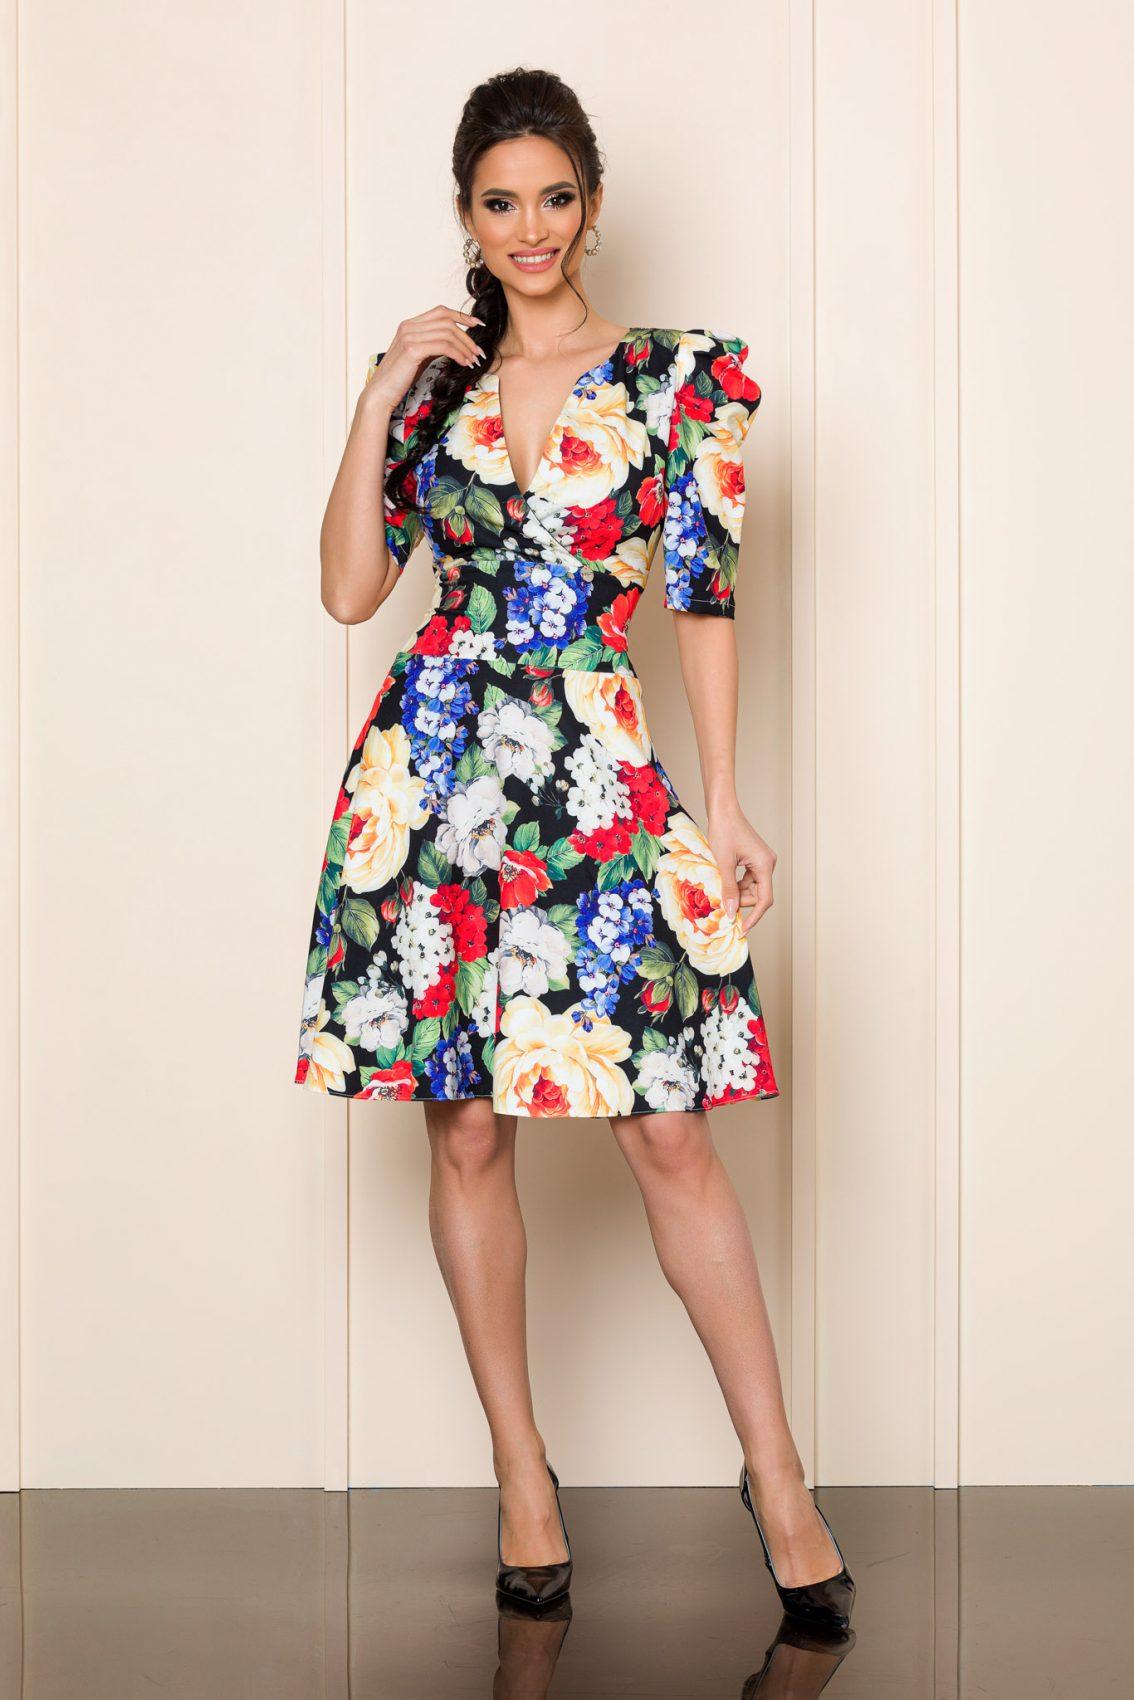 Floral Φόρεμα Με Φουσκωτό Μανίκι Renee 8016 1